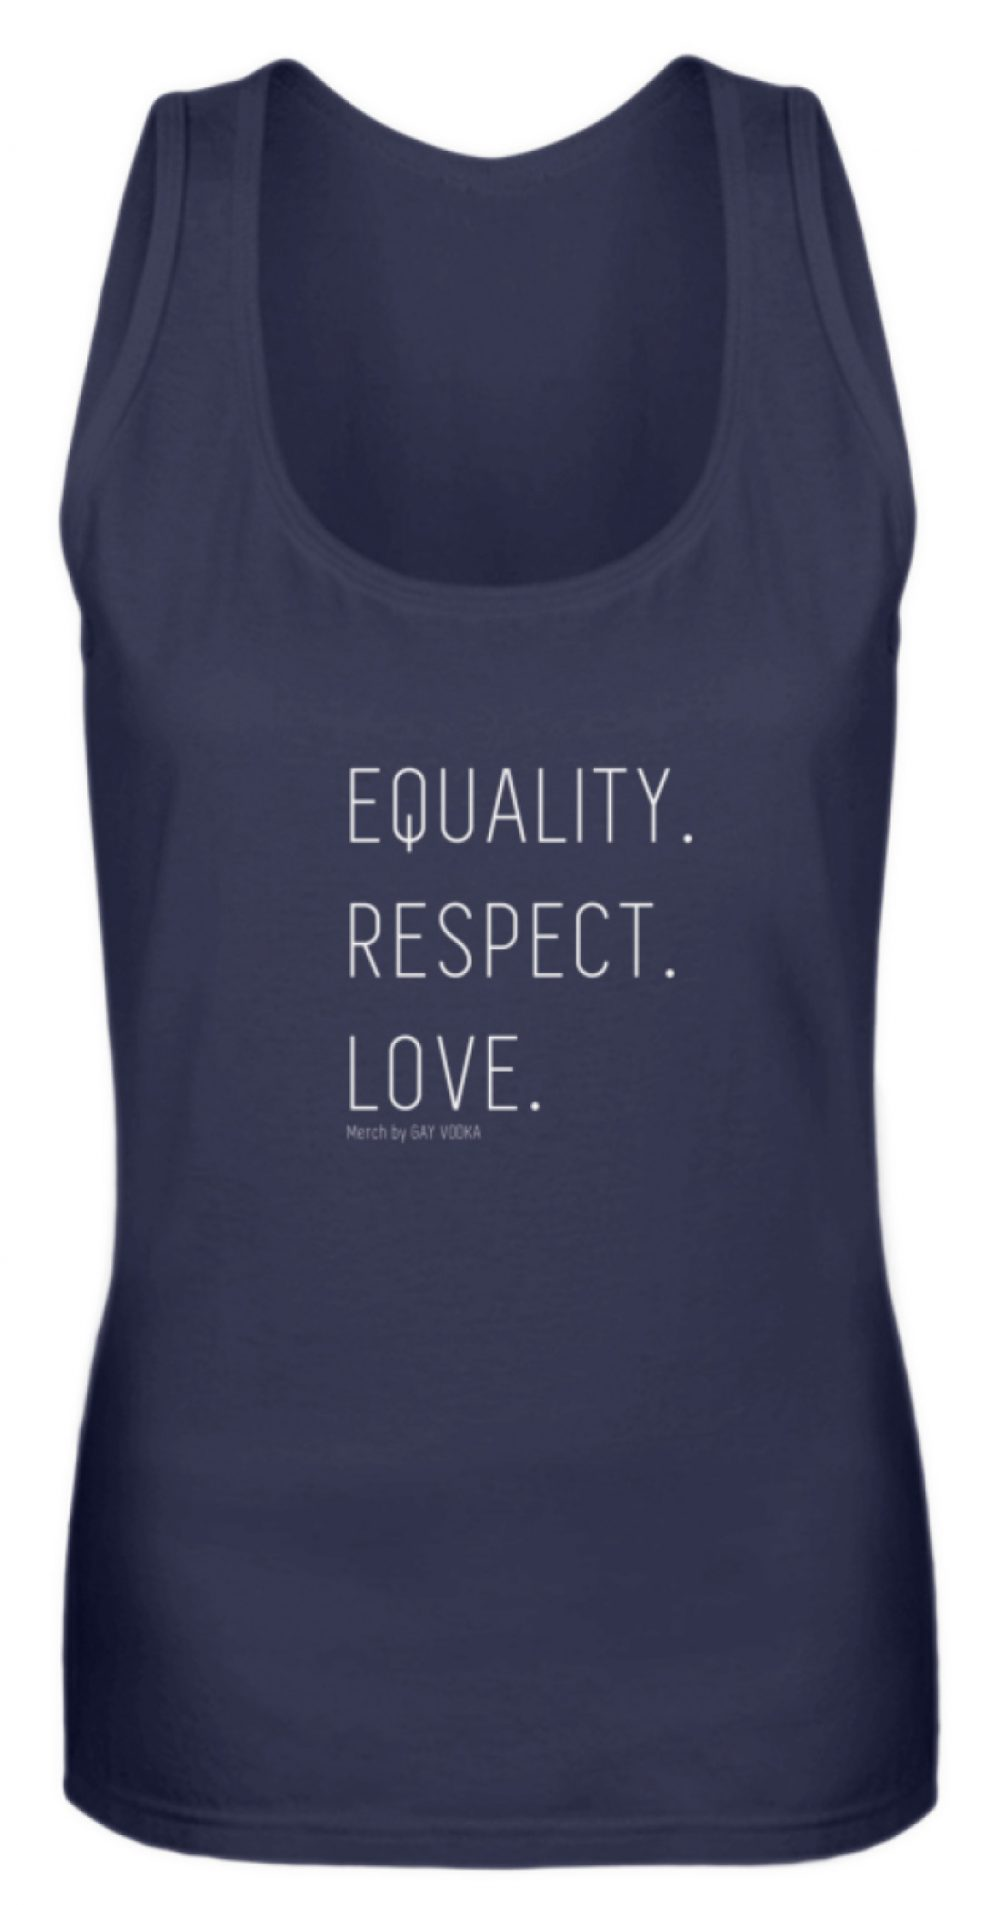 EQUALITY. RESPECT. LOVE. - Frauen Tanktop-198